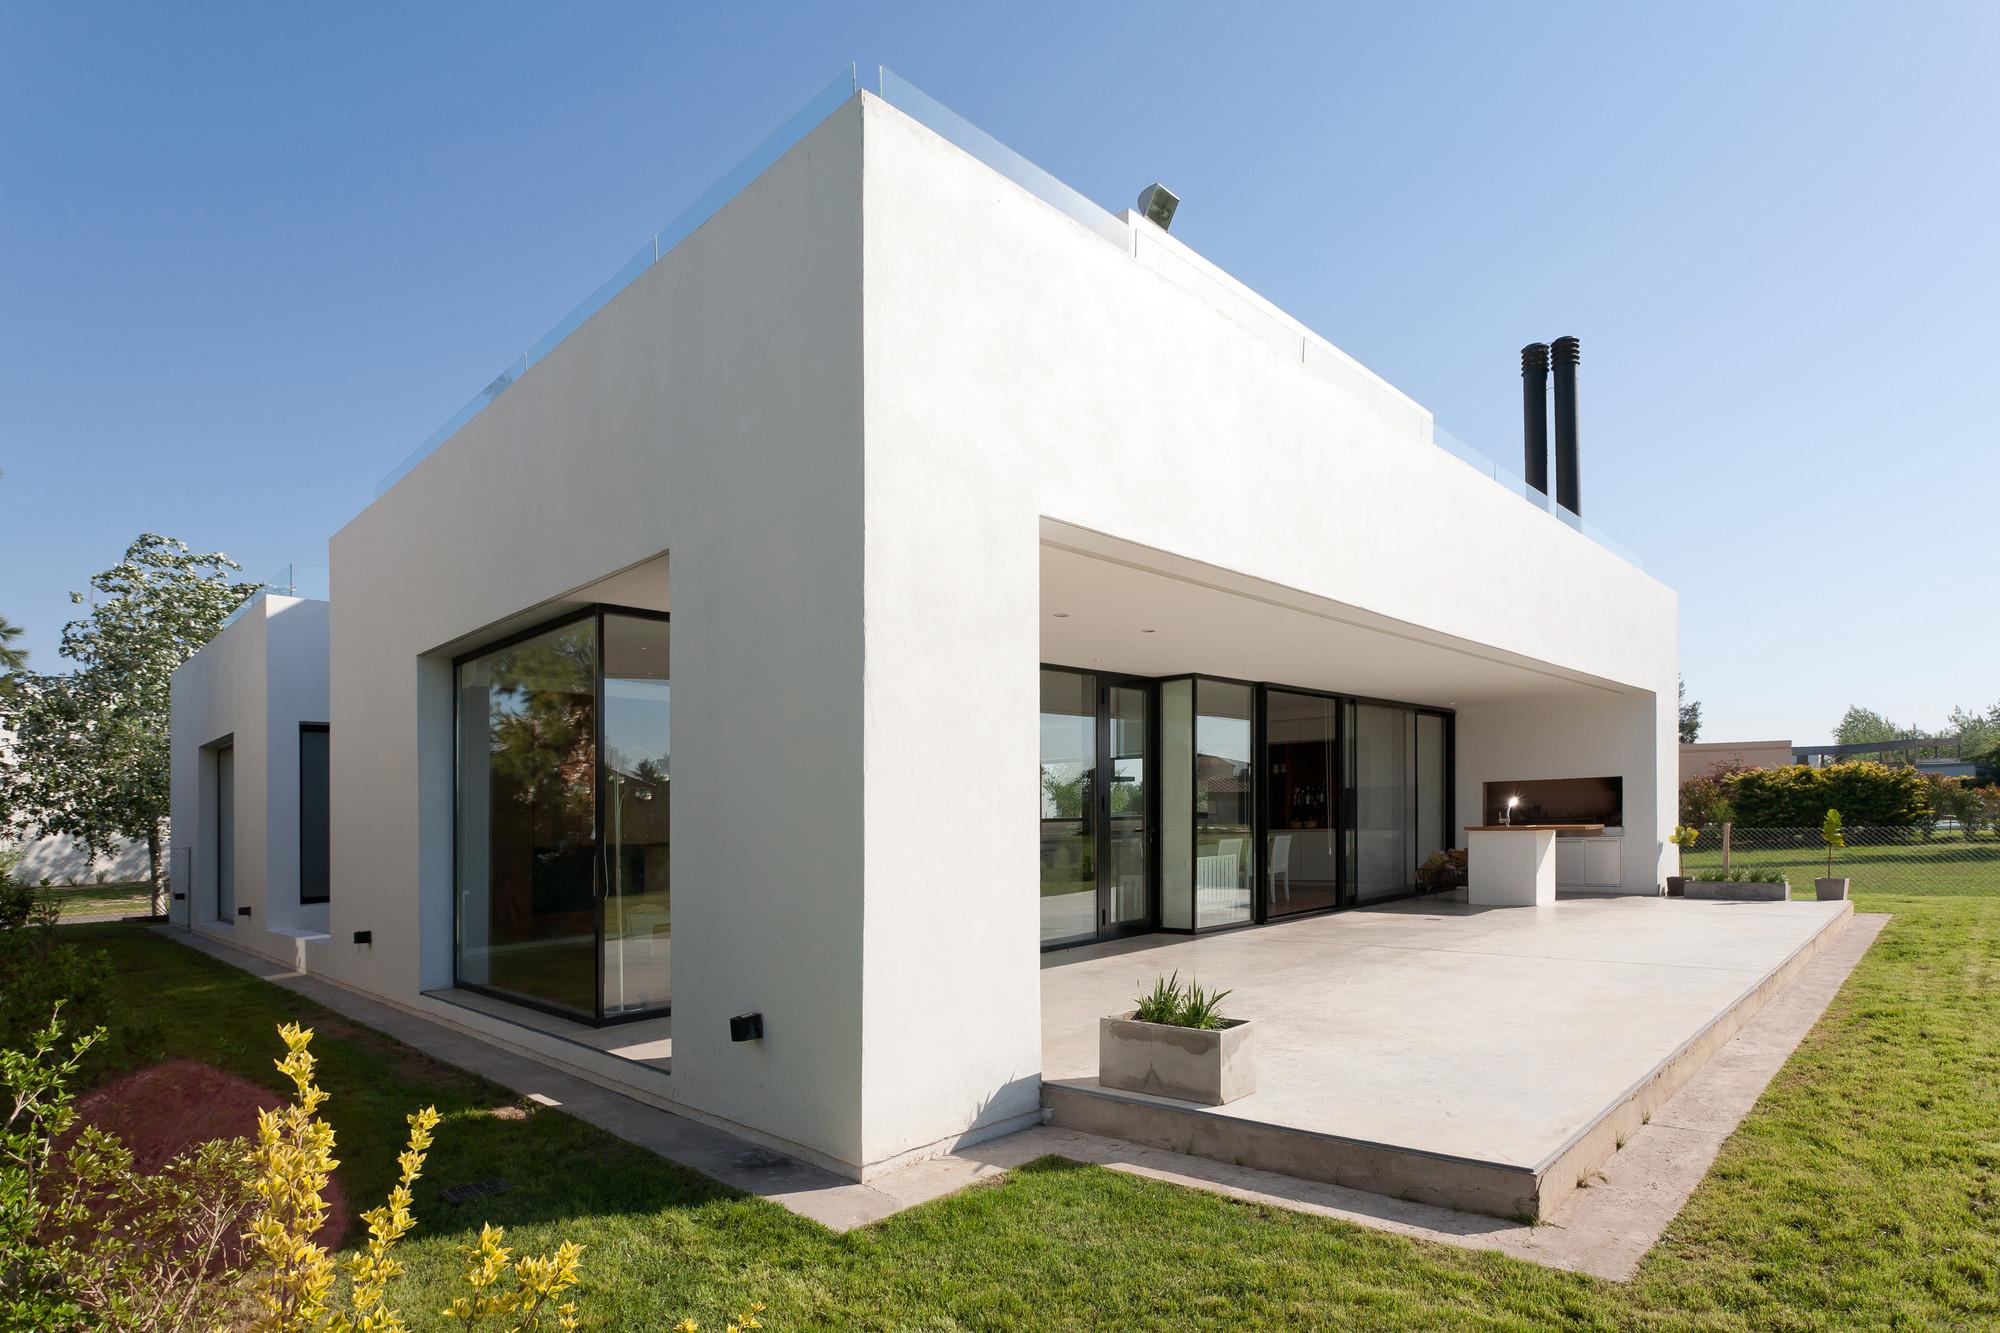 MC House / VismaraCorsi Arquitectos, Courtesy of VismaraCorsi Arquitectos